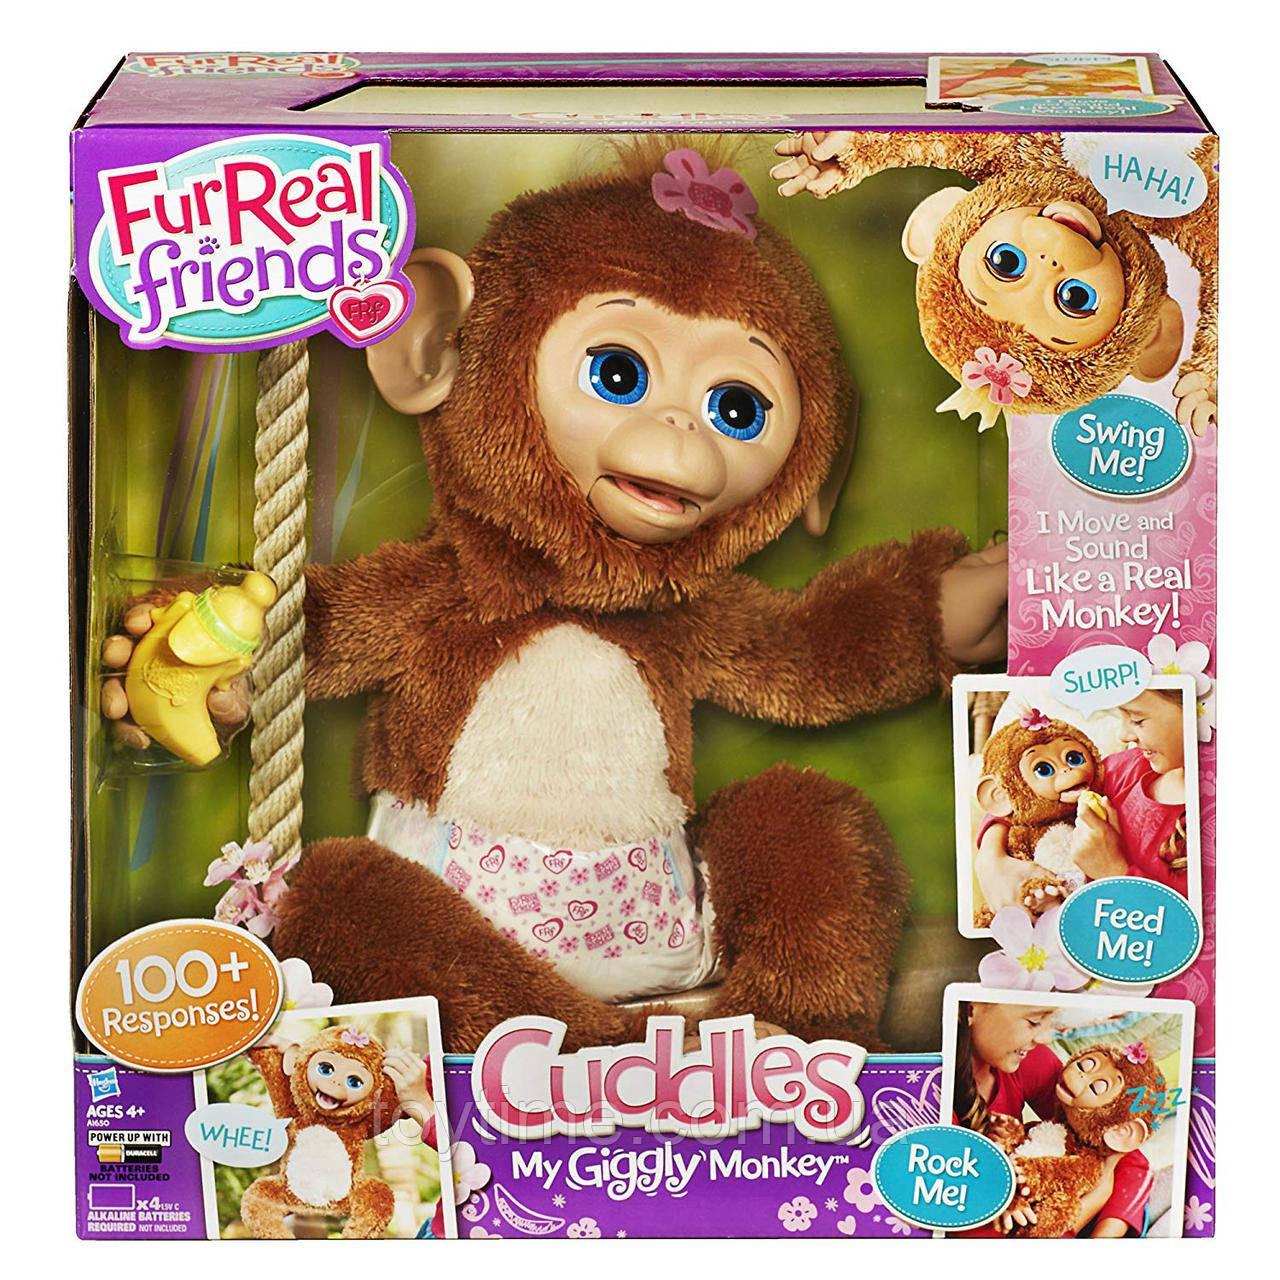 Fur Real Friends Смешливая обезьянка / Fur Real Friends Cuddles My Giggly Monkey Pet